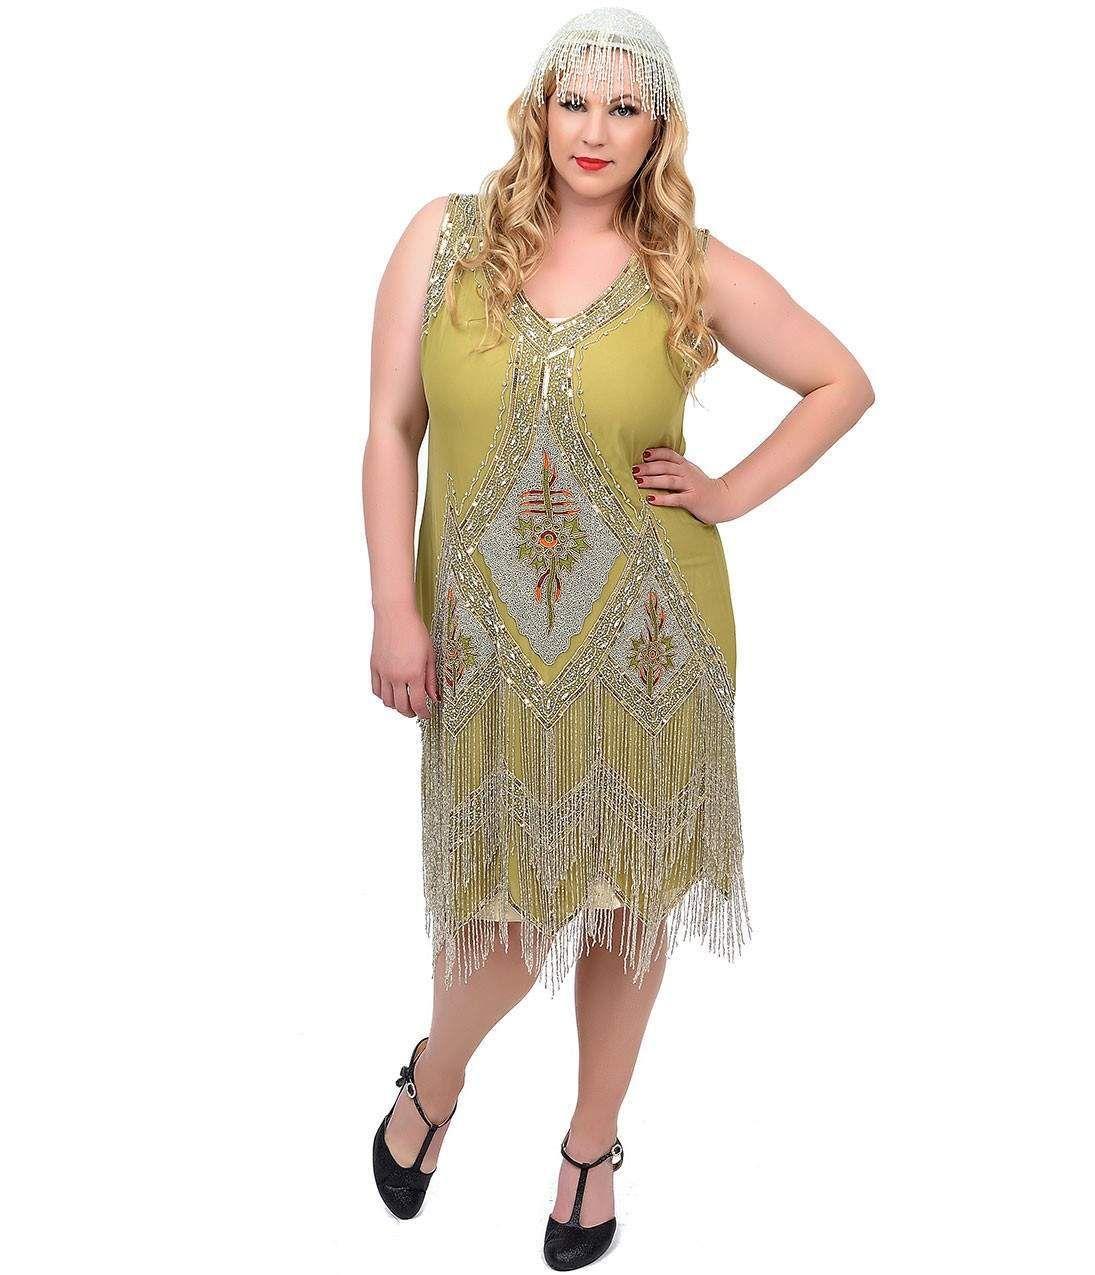 Unique Vintage Plus Size Green Silver Embroidered Somerset Flapper Dress Plus Size Flapper Dress Plus Size Vintage Clothing Plus Size Flapper Costume